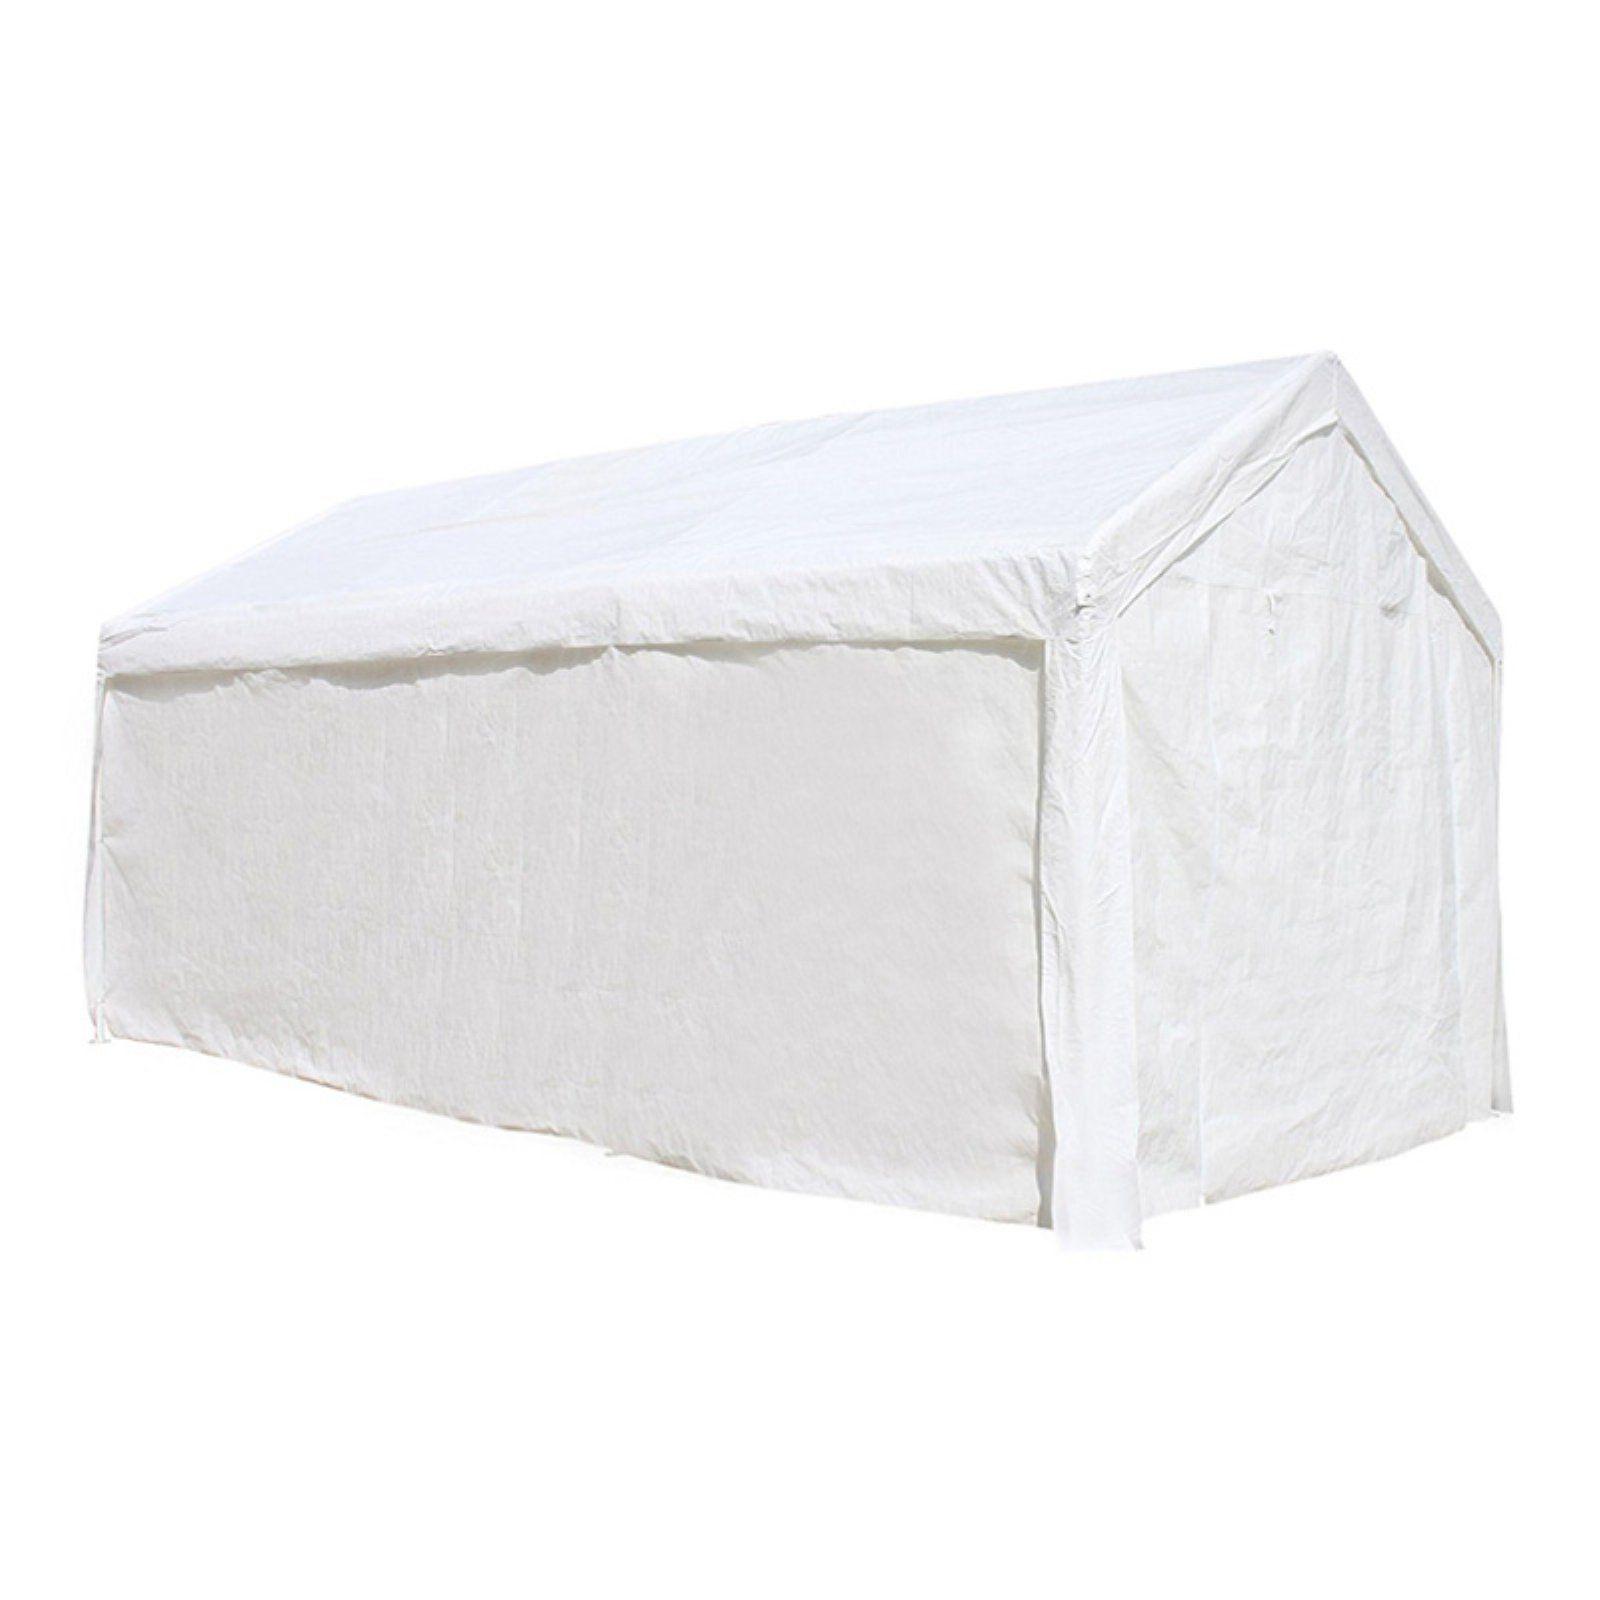 ALEKO 20 x 10 ft. Gazebo Canopy Carport Carport tent